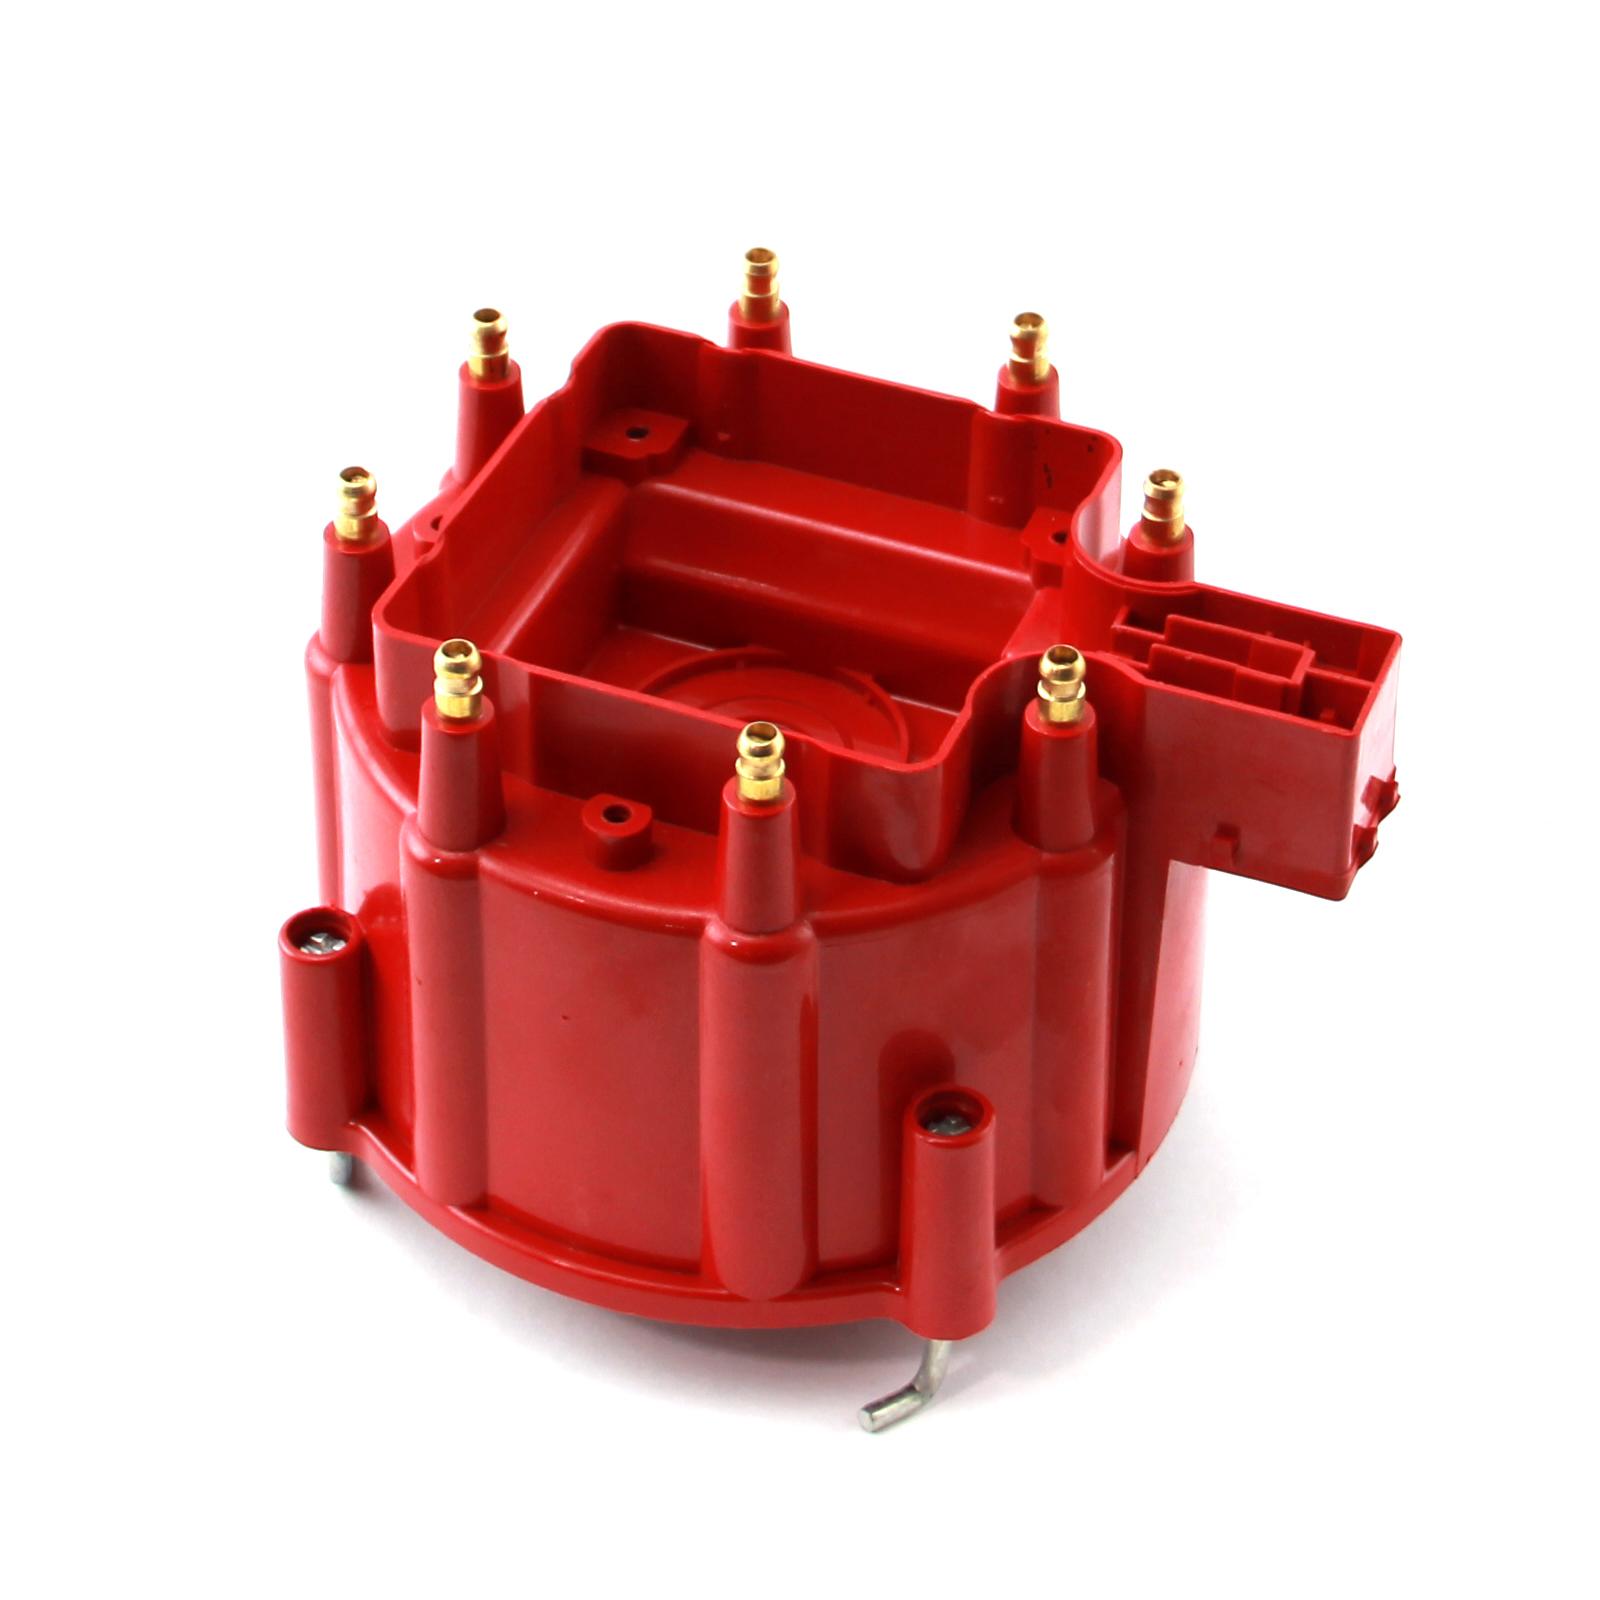 HEI Replacement Distributor Cap Brass Terminals - Red